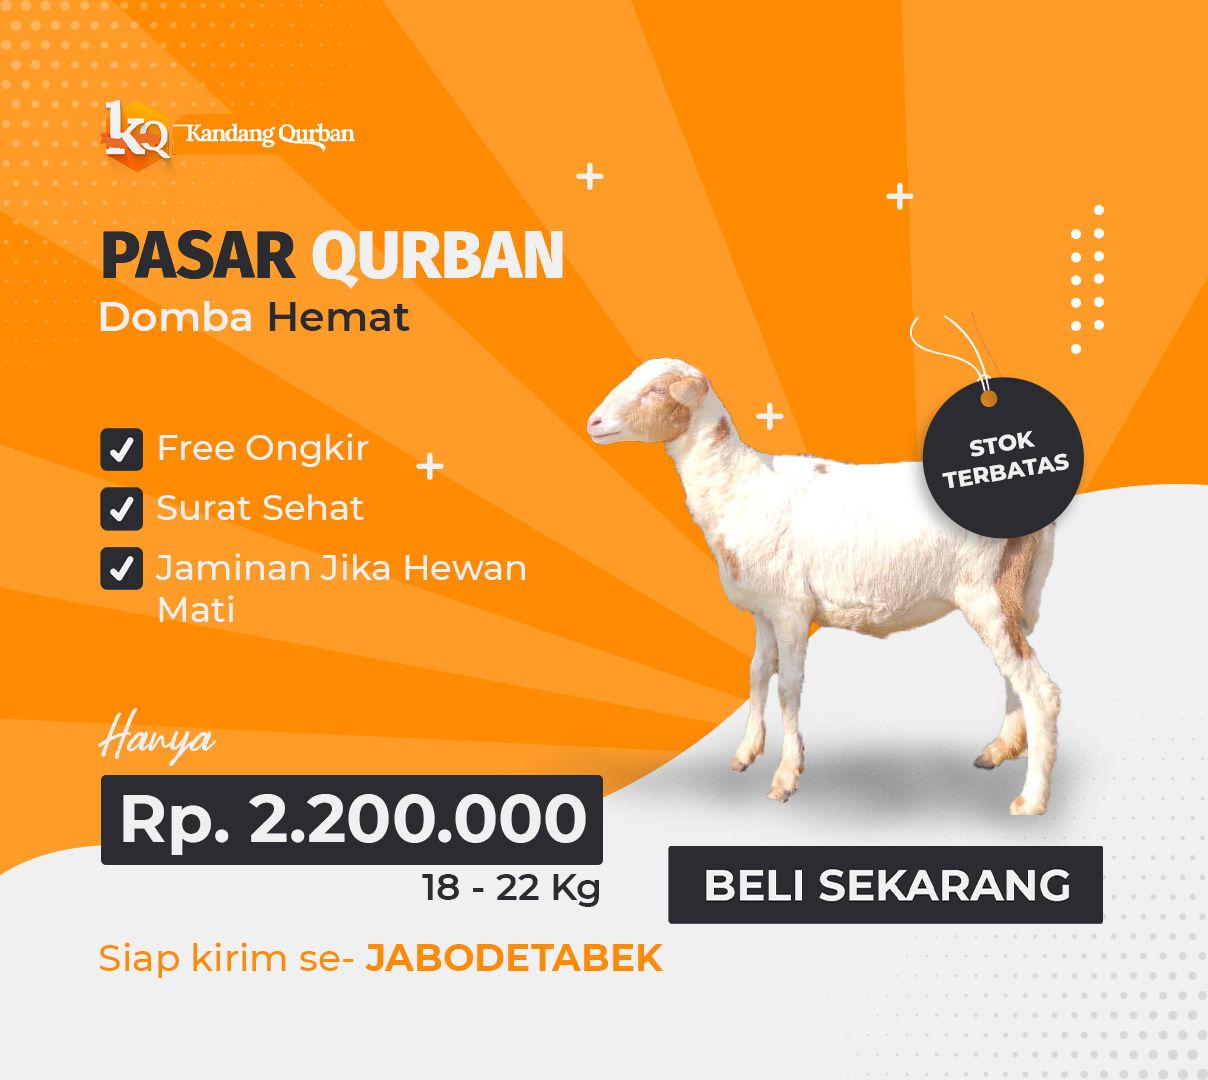 Kandang Qurban Domba Hemat